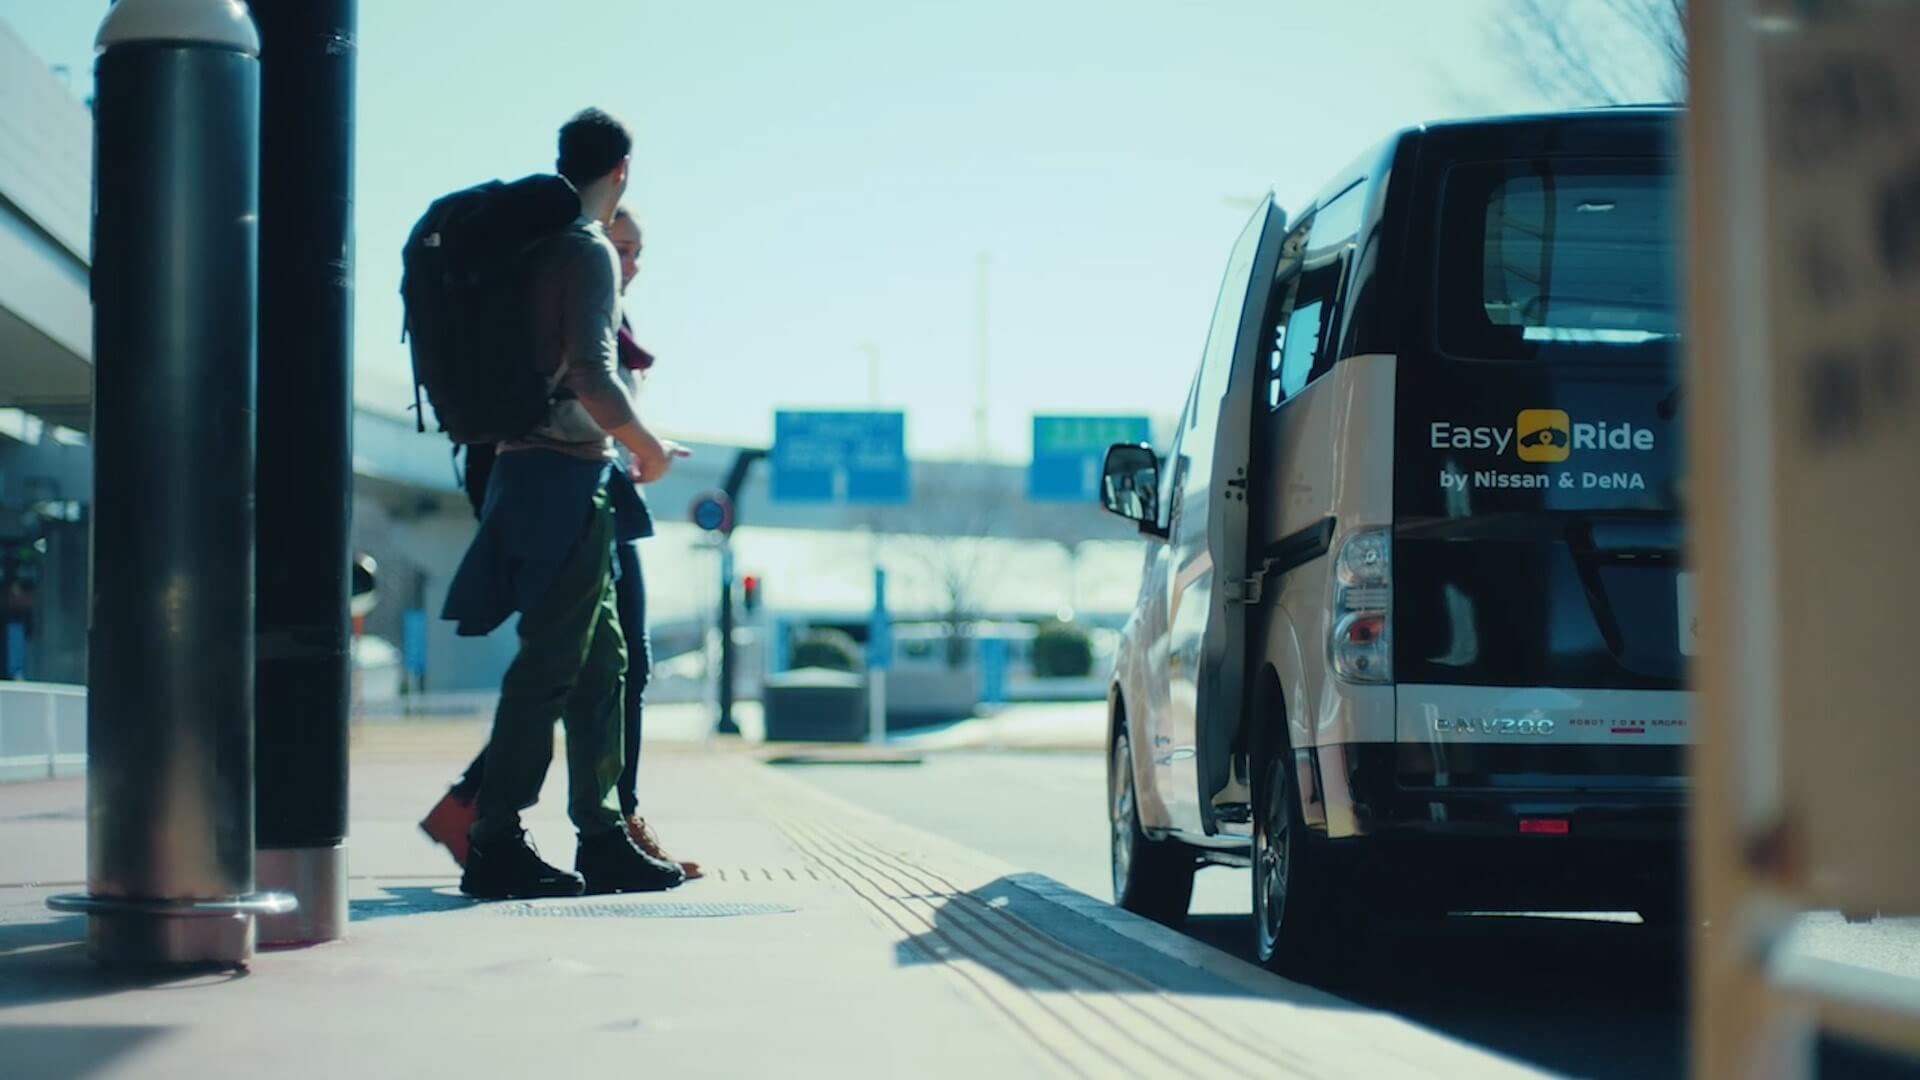 Беспилотные такси Easy Ride